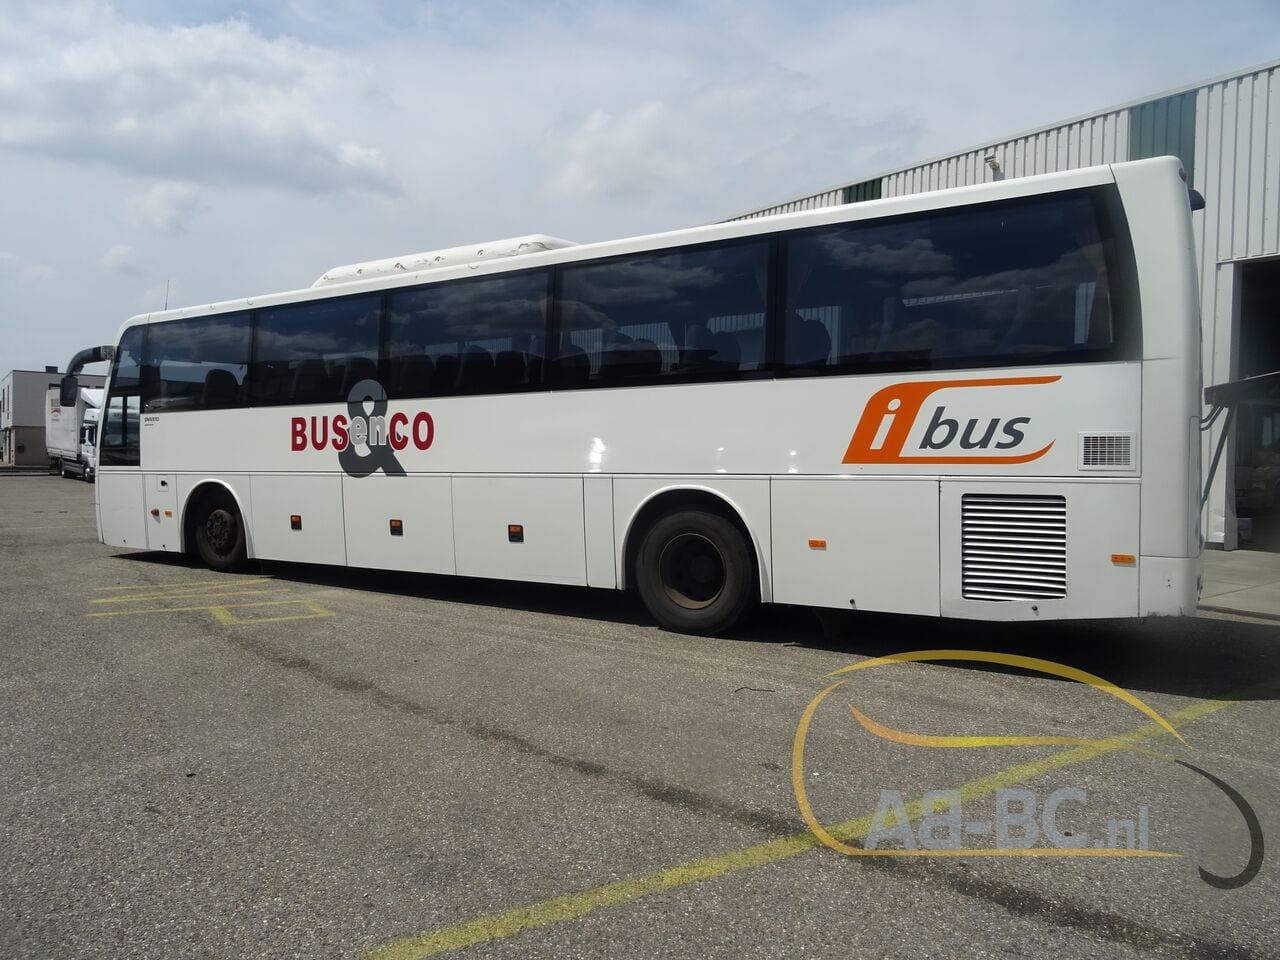 coach-busTEMSA-Safari-RD-DAF-Motor-53-Seats-Euro-5---1623932843480400364_big_95eb65a7ace1e6965d51dc1cb41d86cf--21061715155620919600